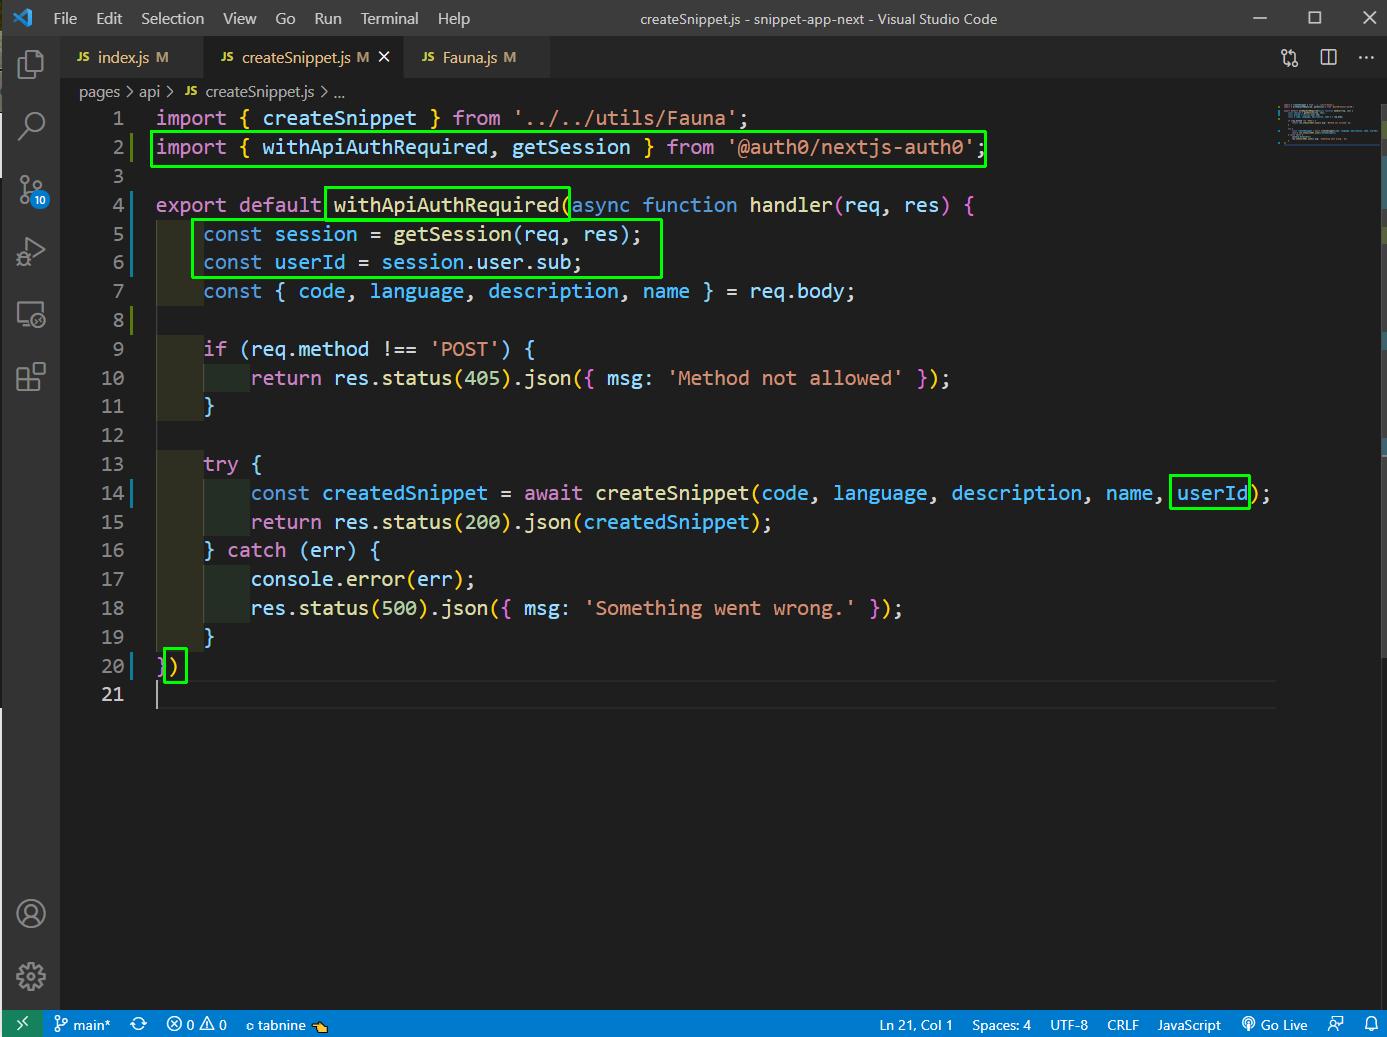 createSnippet.js